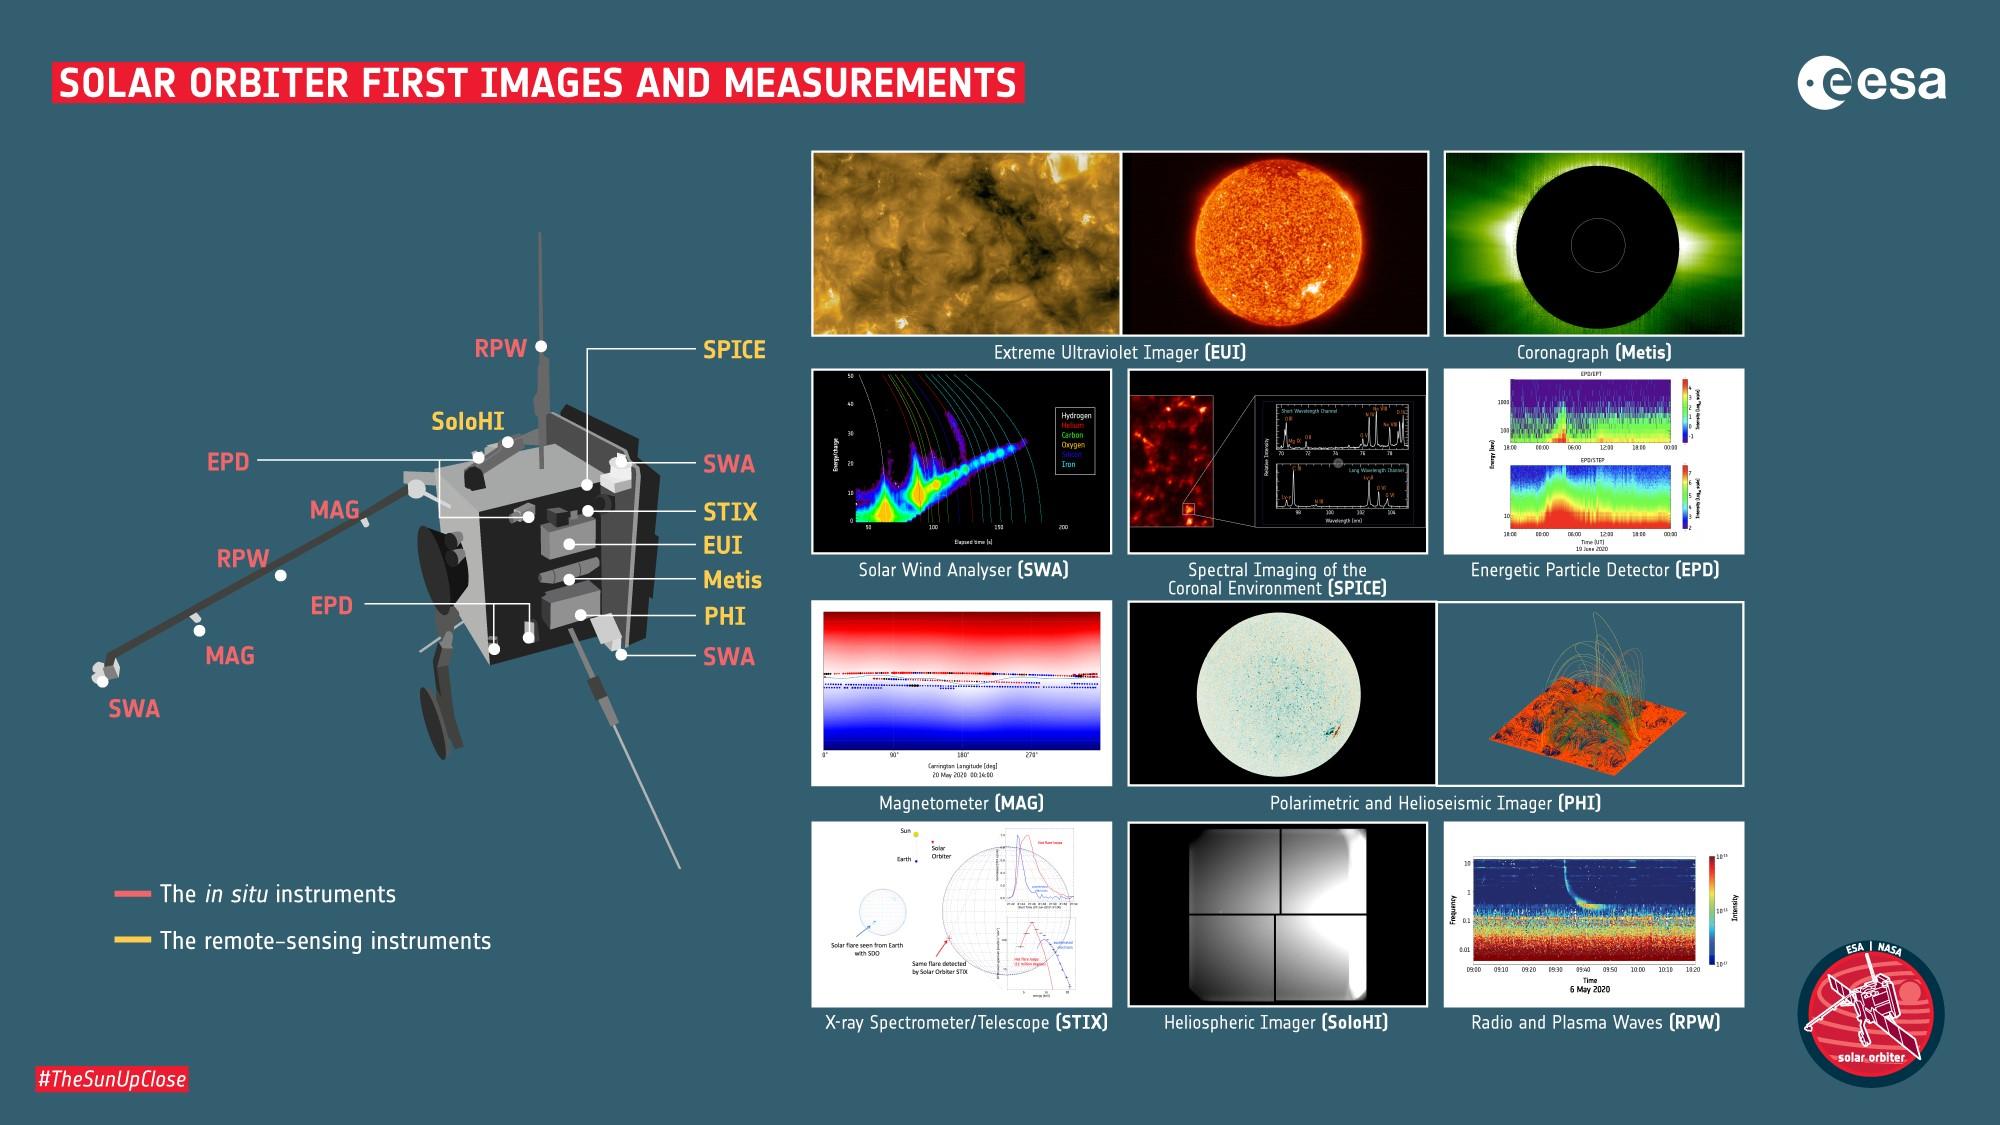 Solar_Orbiter_Infographic_All_Instruments_2k.jpg